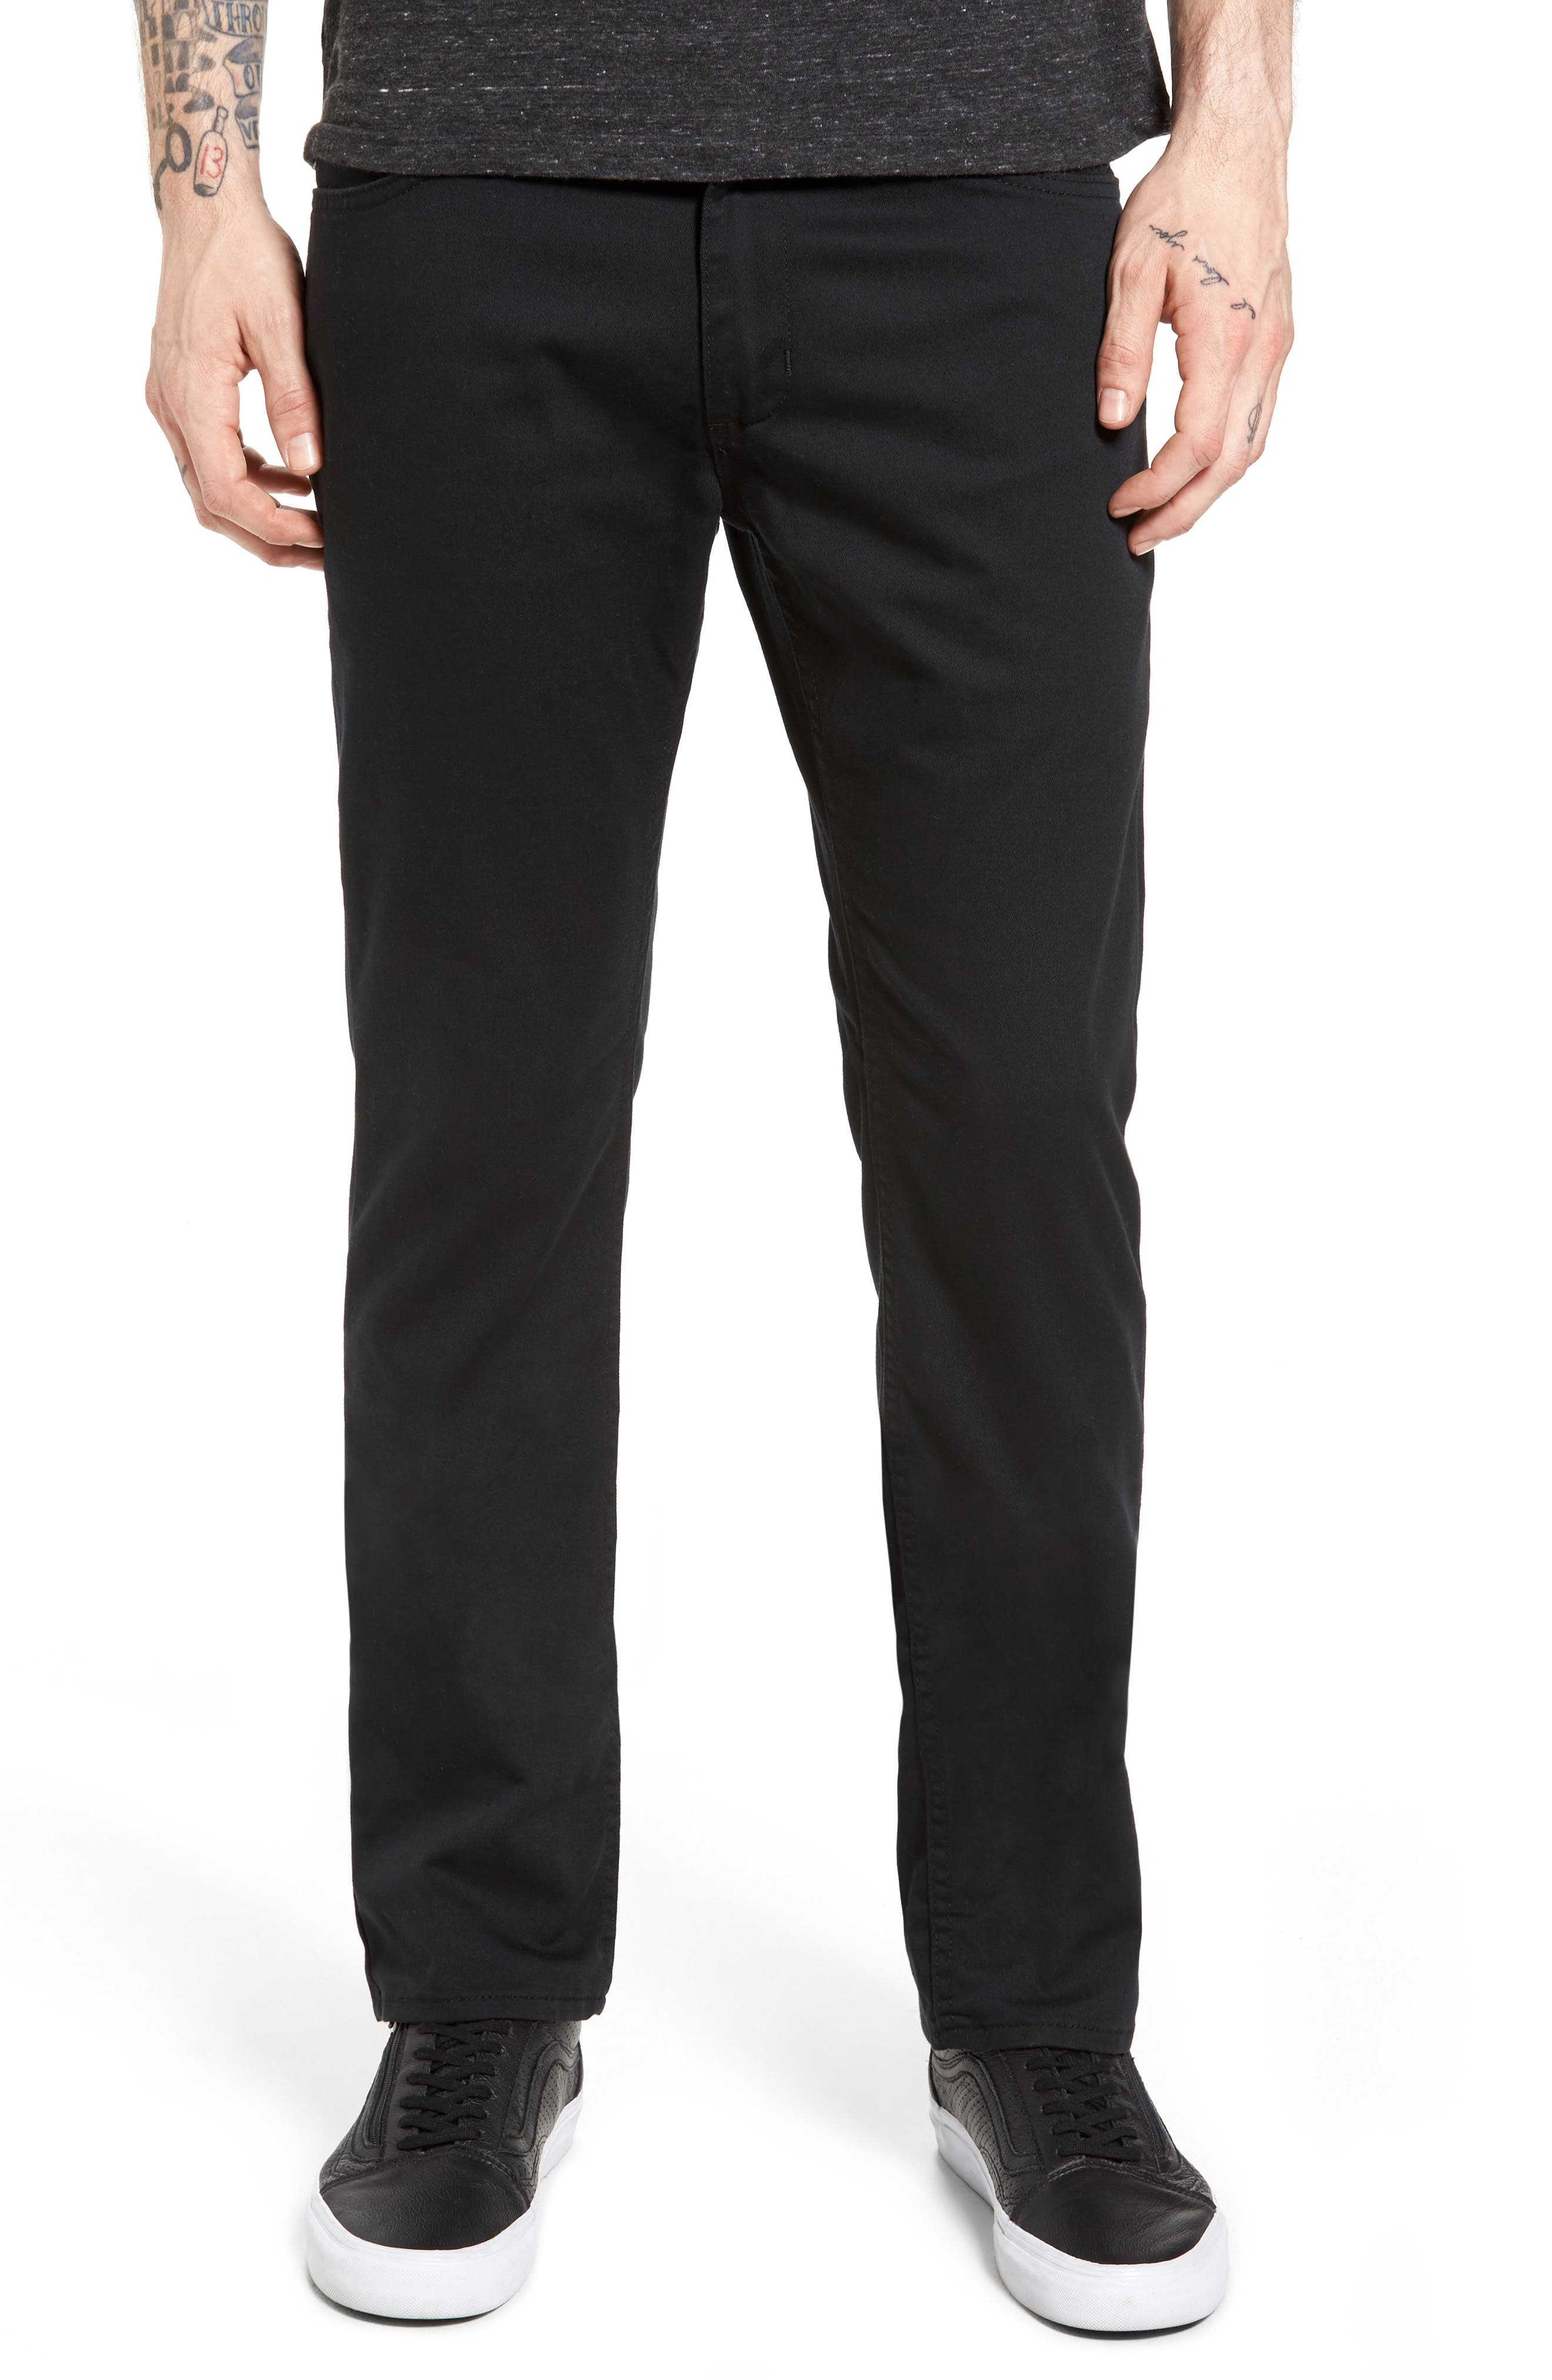 V56 Covina II Slim Fit Pants,                             Alternate thumbnail 2, color,                             001